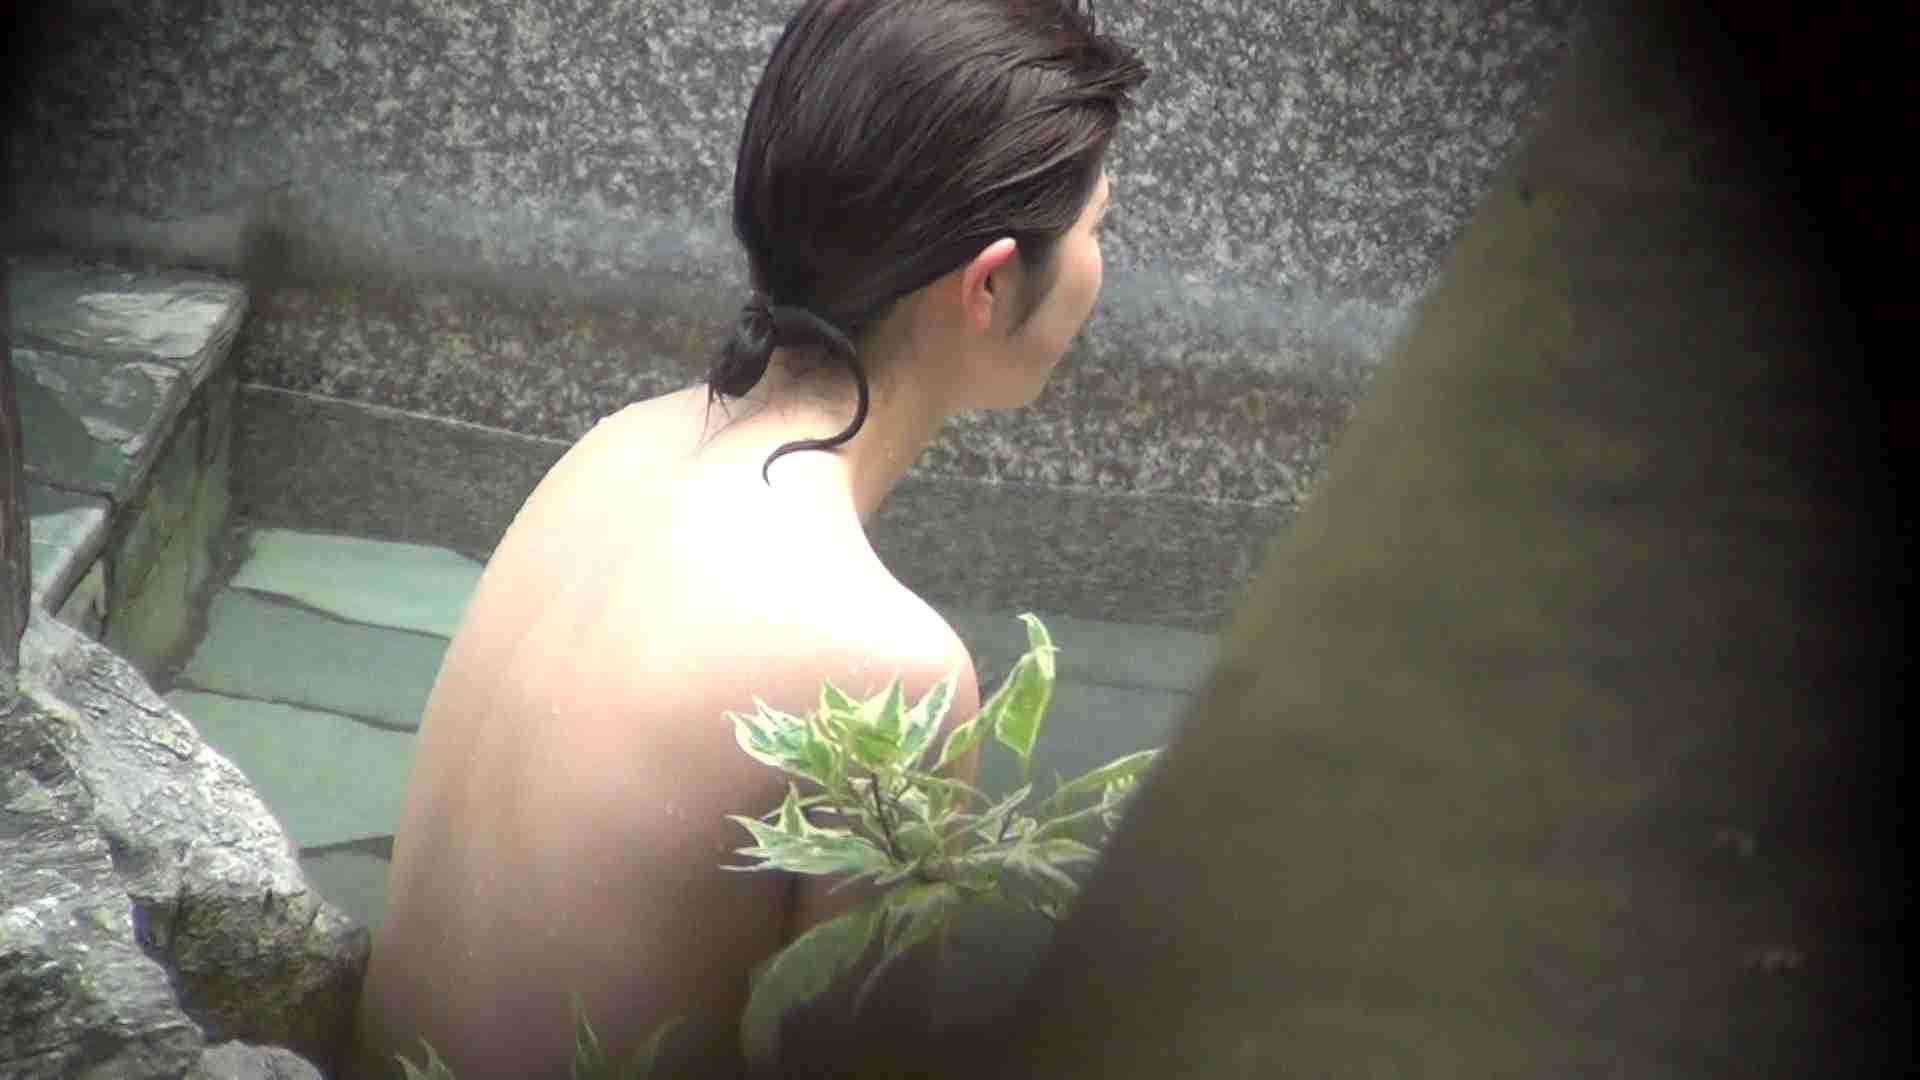 Aquaな露天風呂Vol.262 OL女体 | 露天  55連発 46